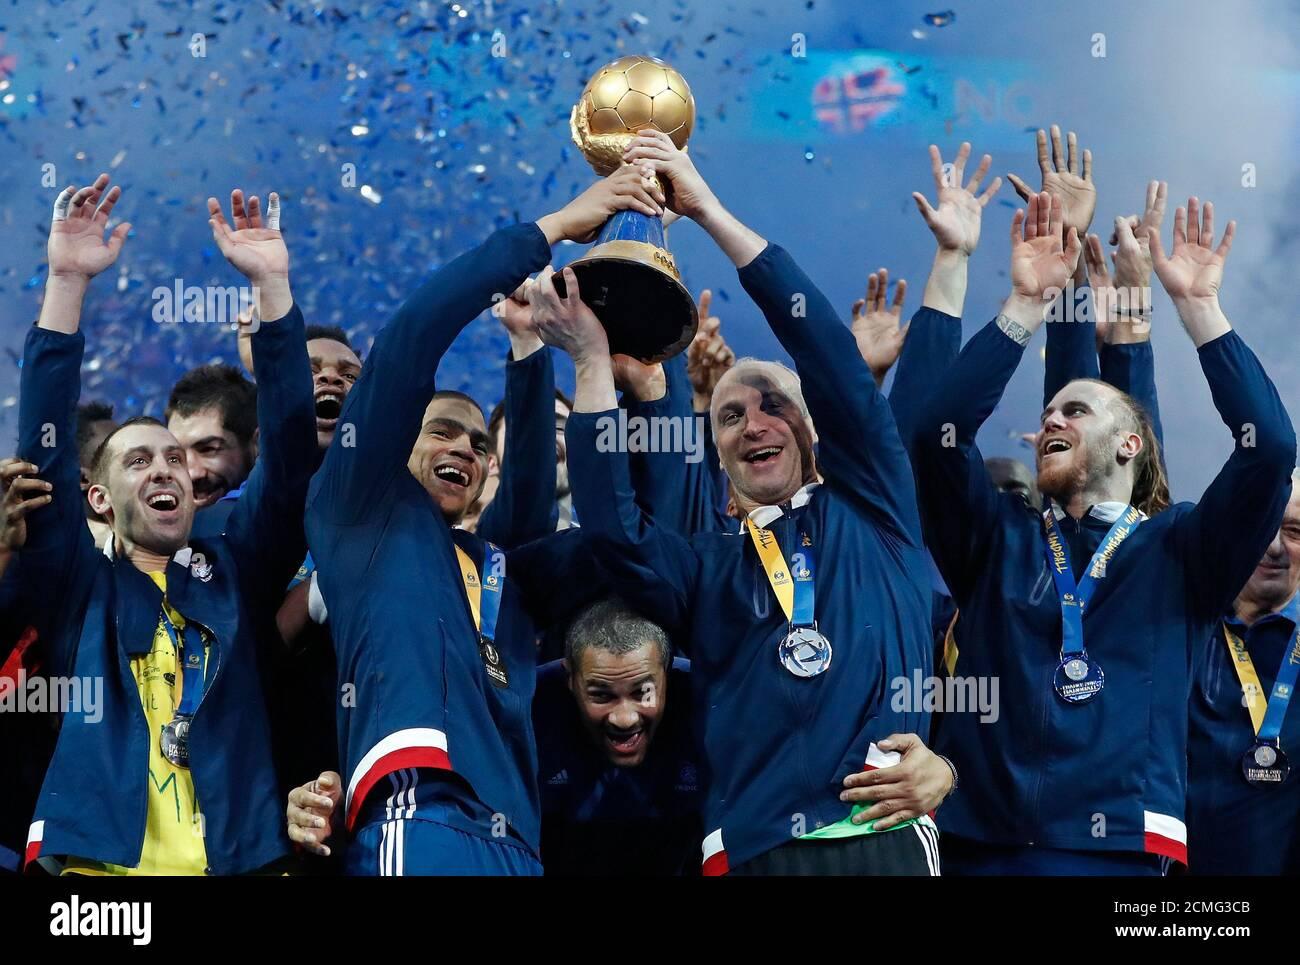 Handball France High Resolution Stock Photography And Images Alamy